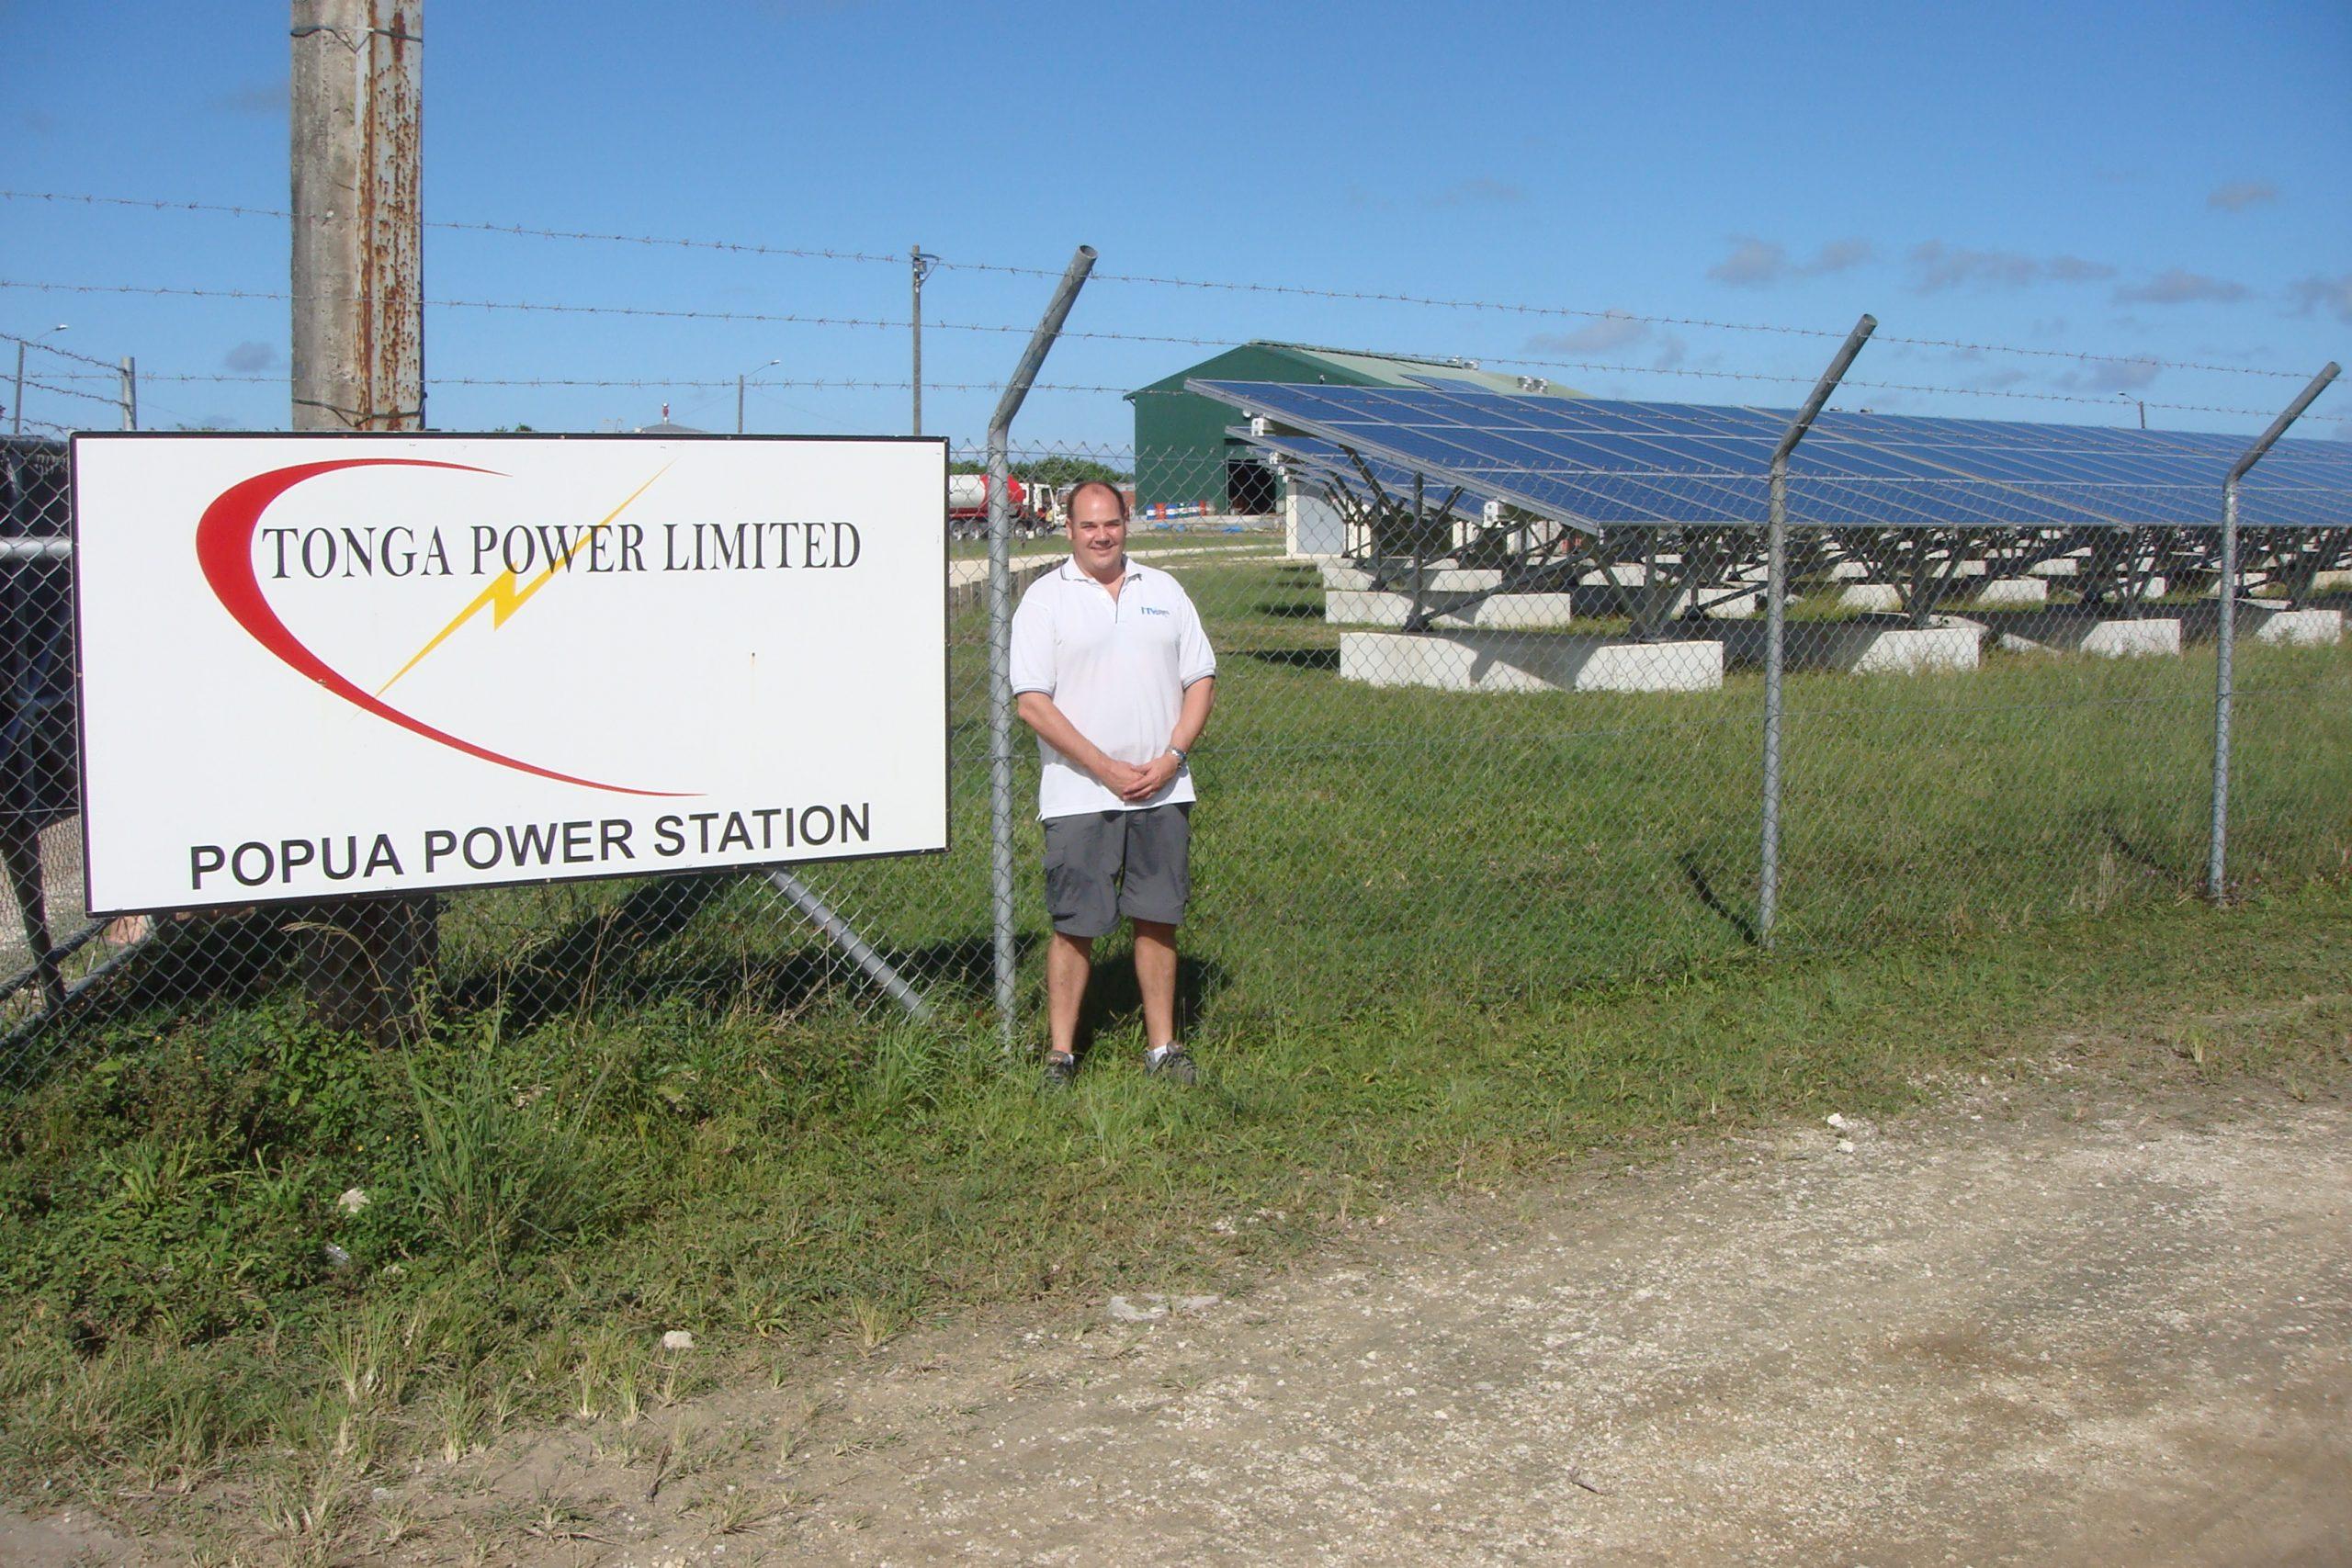 Working for Tonga Power